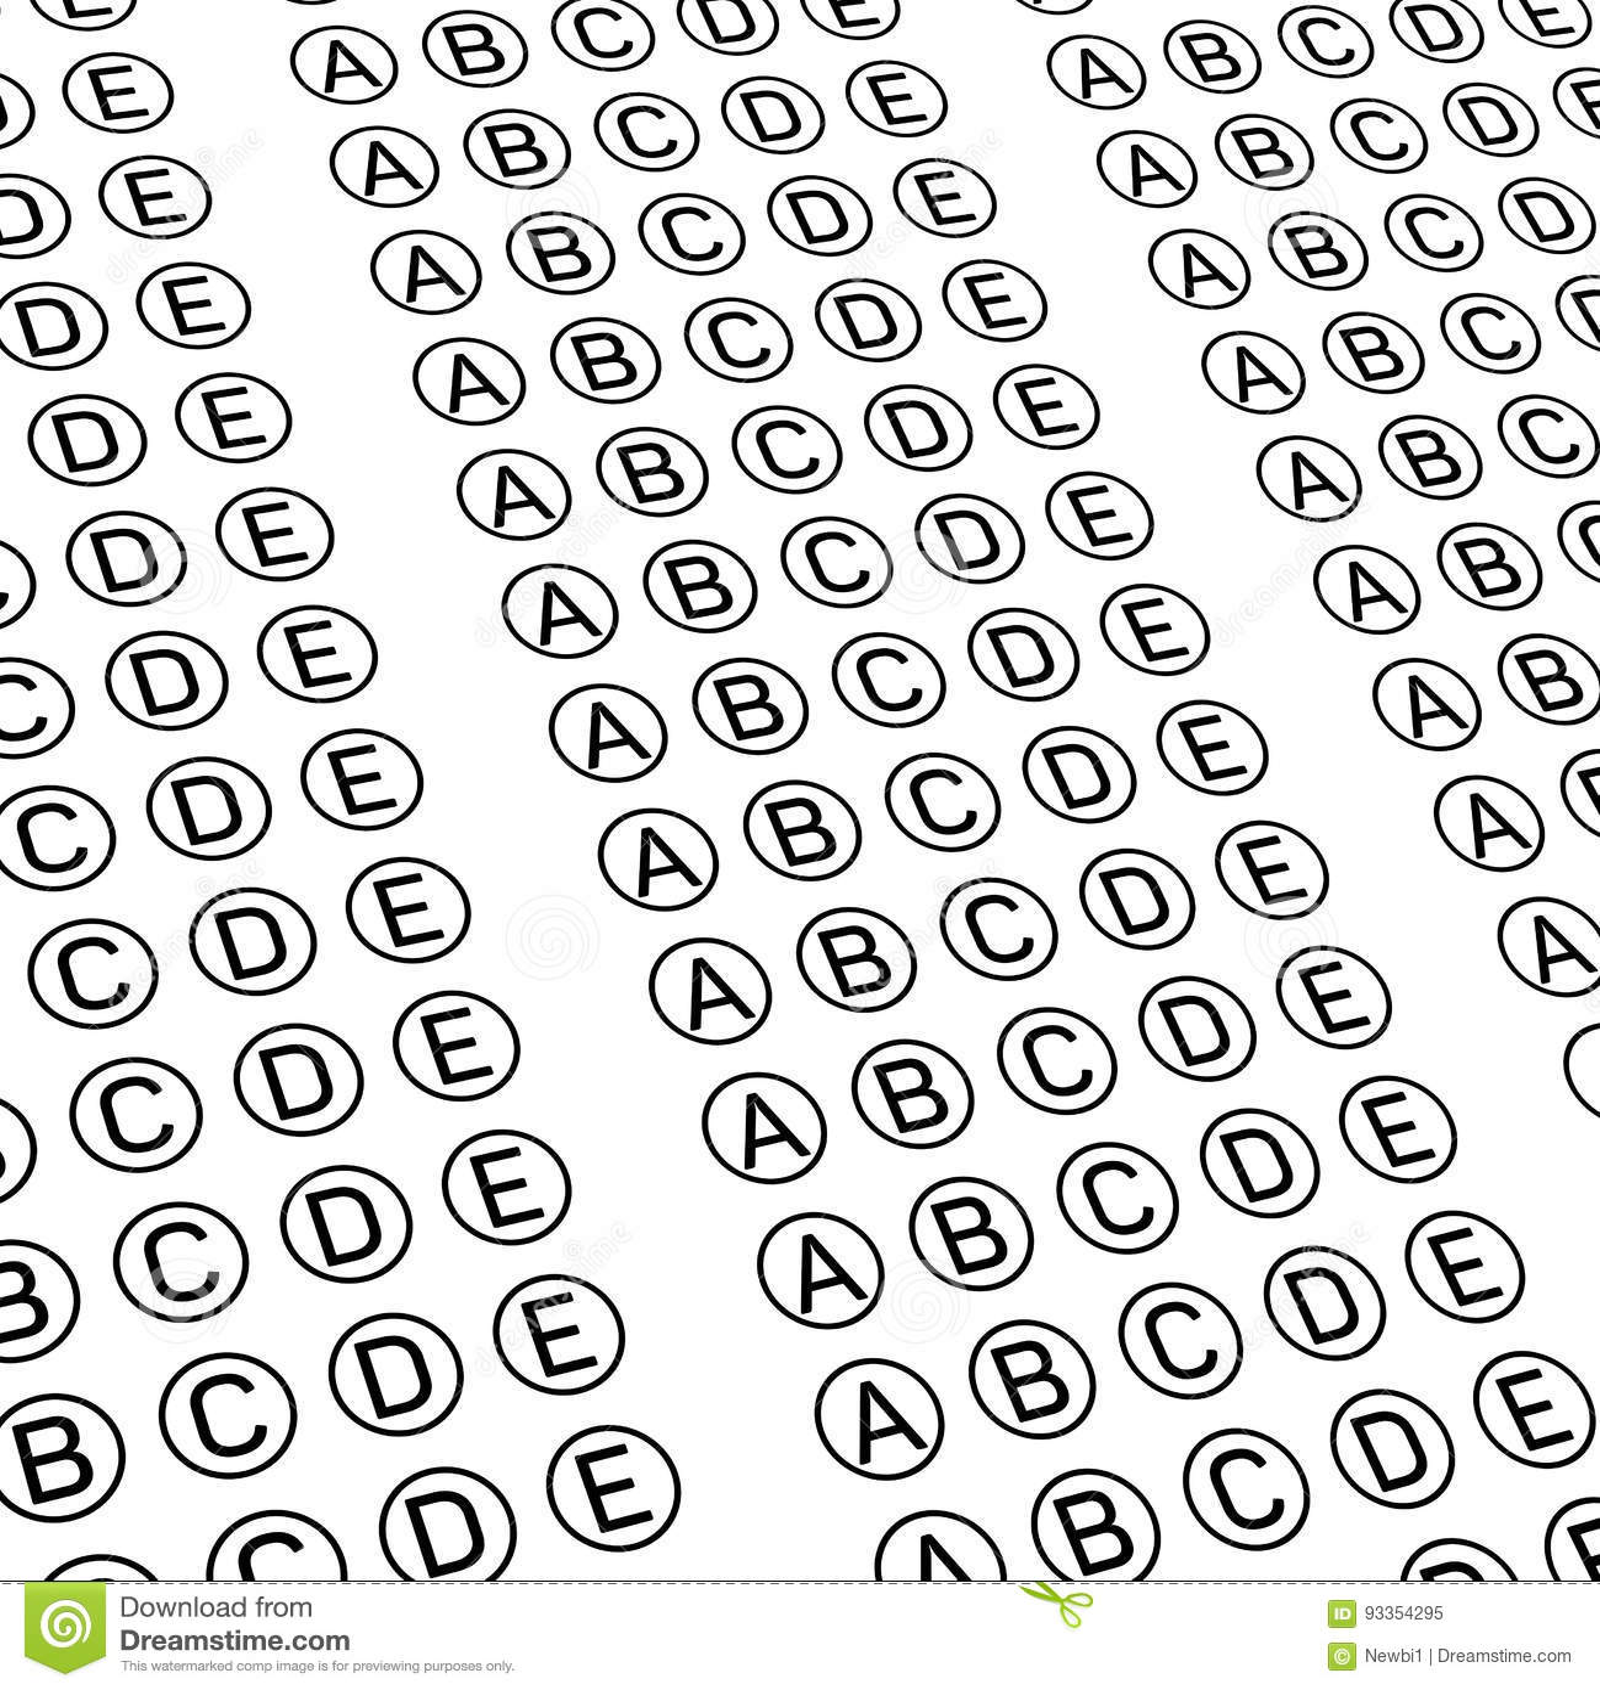 Examination Test Sheet. Education Concept Cartoon Vector